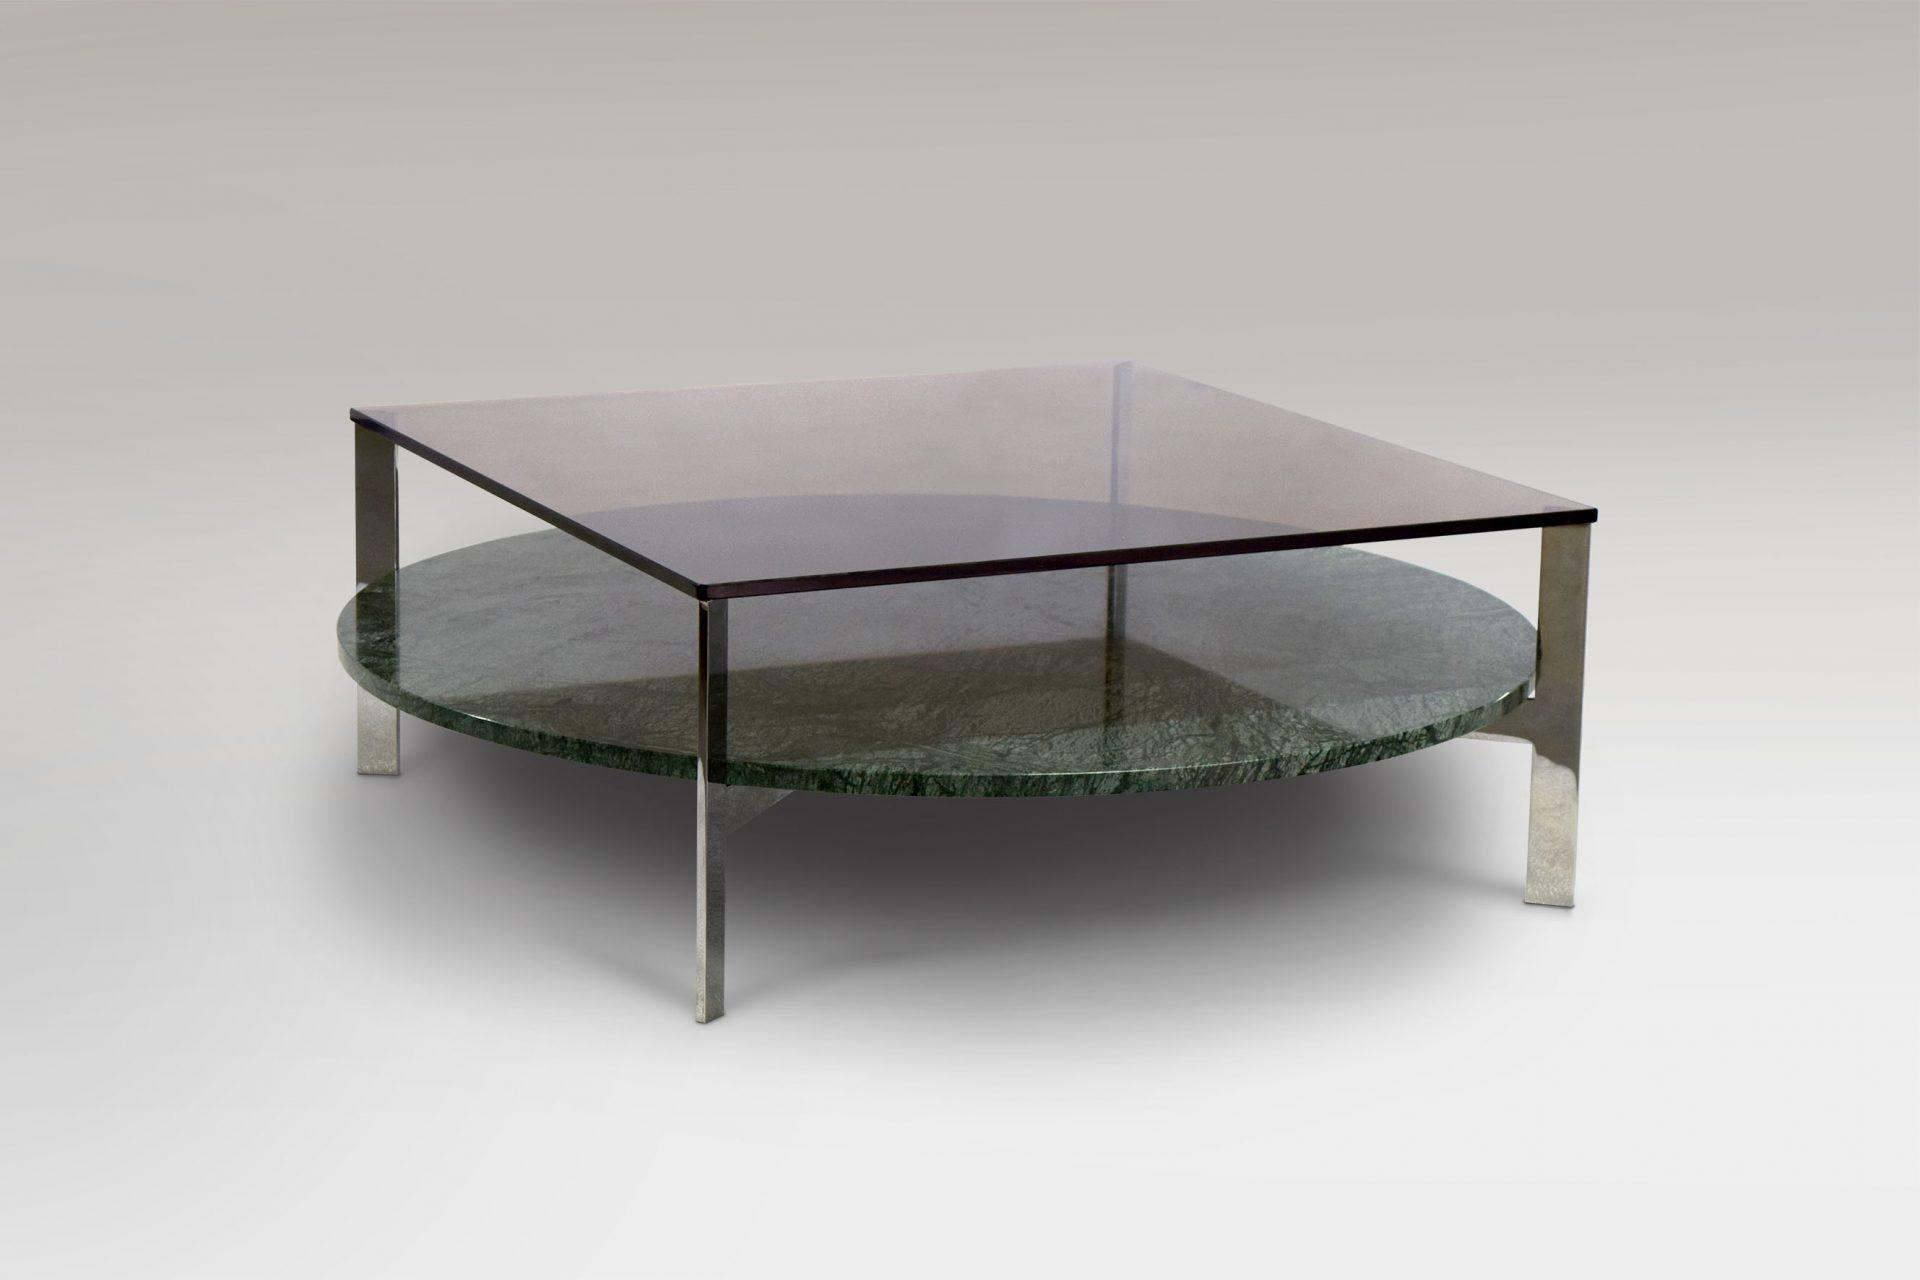 table basse monaco rf studio agence de design paris. Black Bedroom Furniture Sets. Home Design Ideas